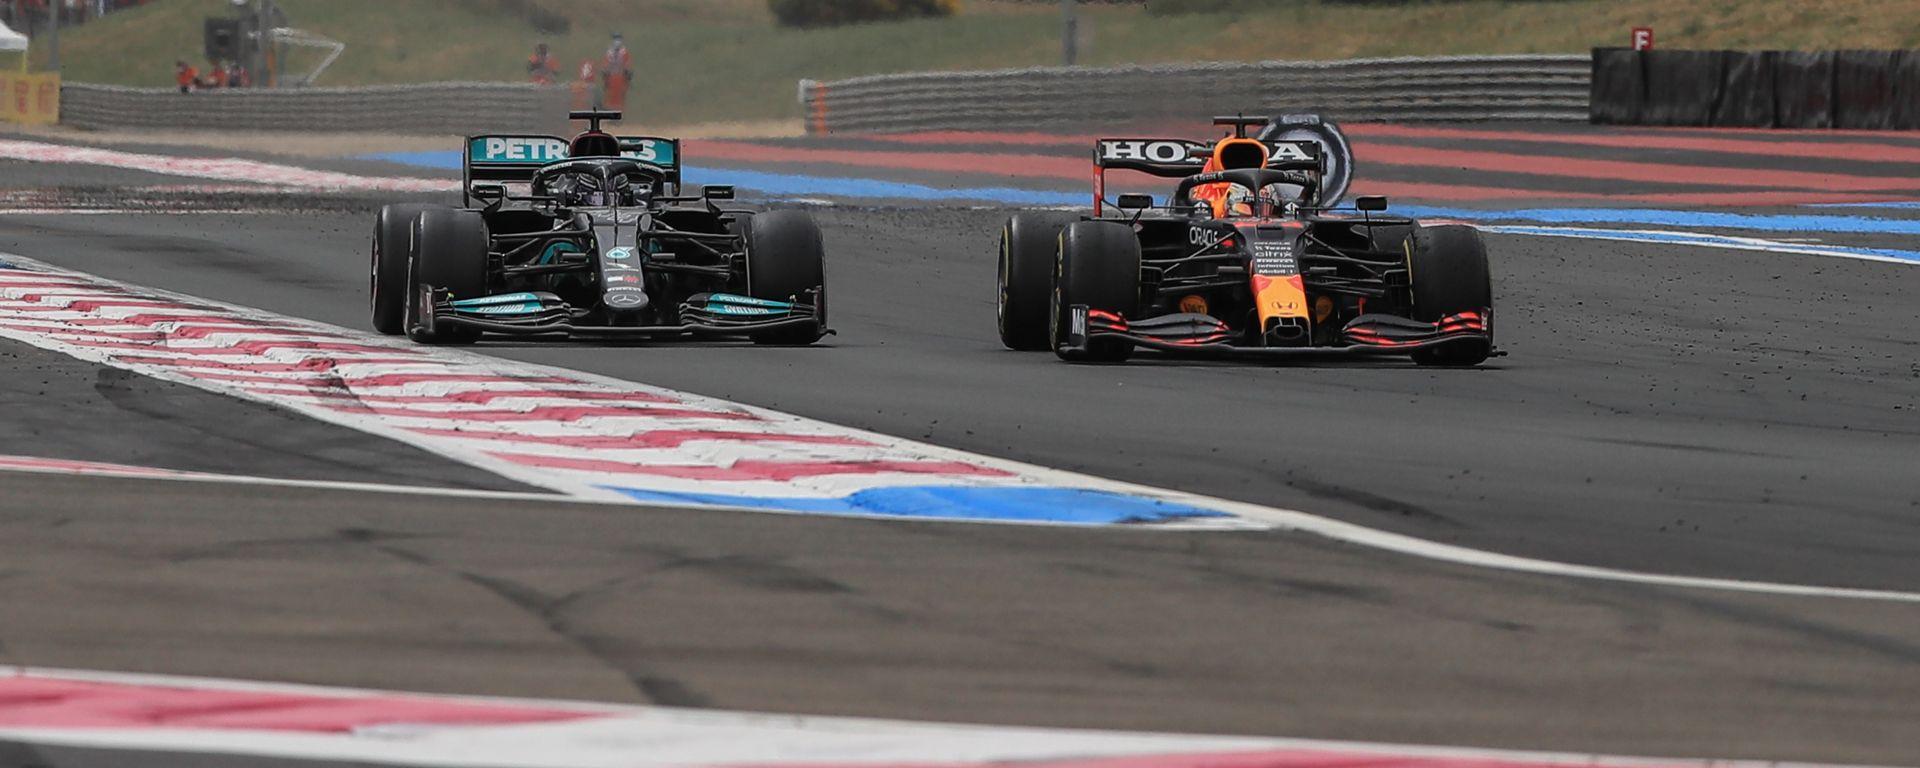 F1 GP Francia 2021, Le Castellet: Lewis Hamilton (Mercedes), Max Verstappen (Red Bull)